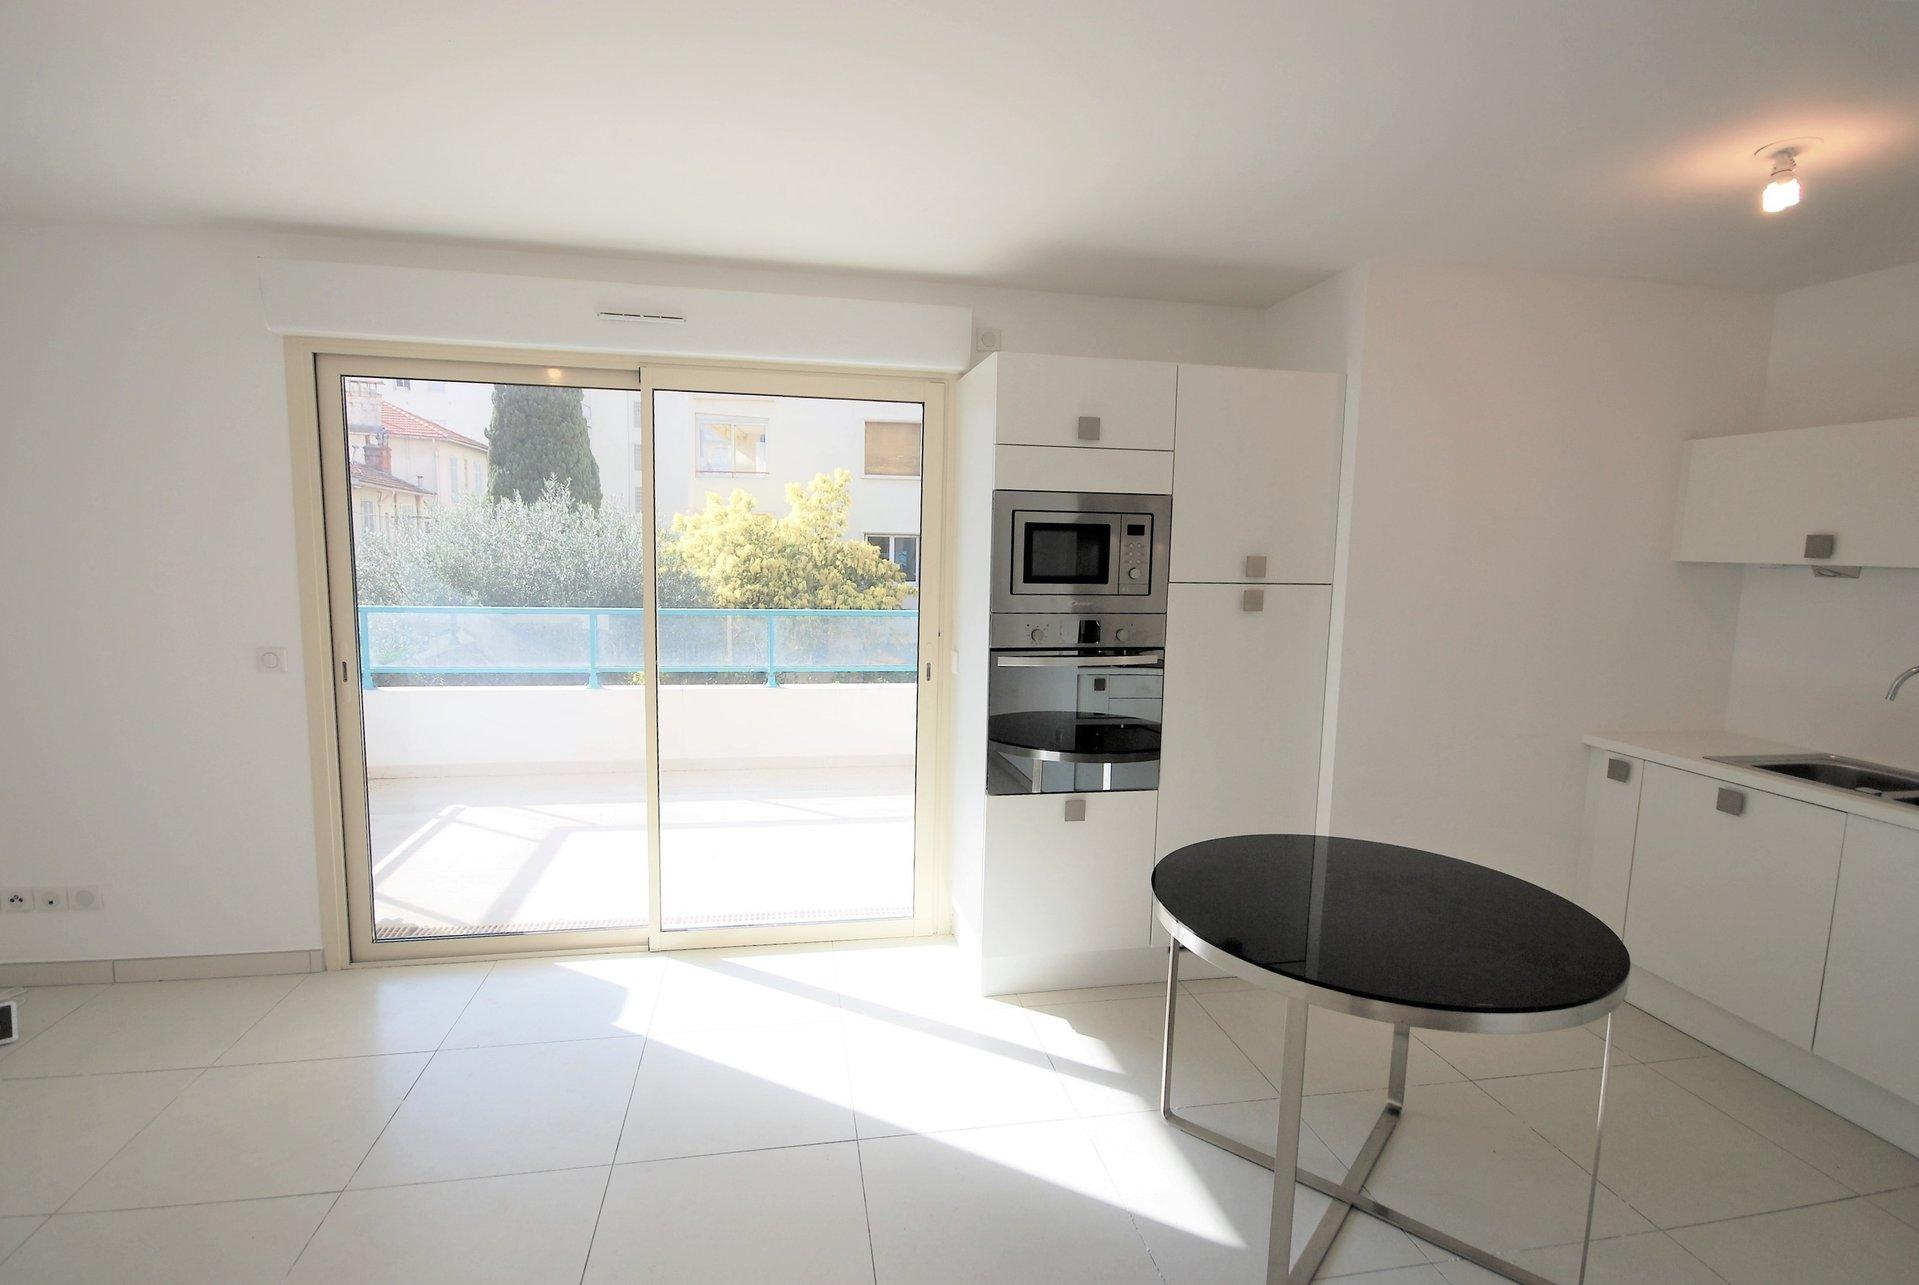 Cannes, Basse-Californie, 2 bedrooms apartment, terrace, parking.